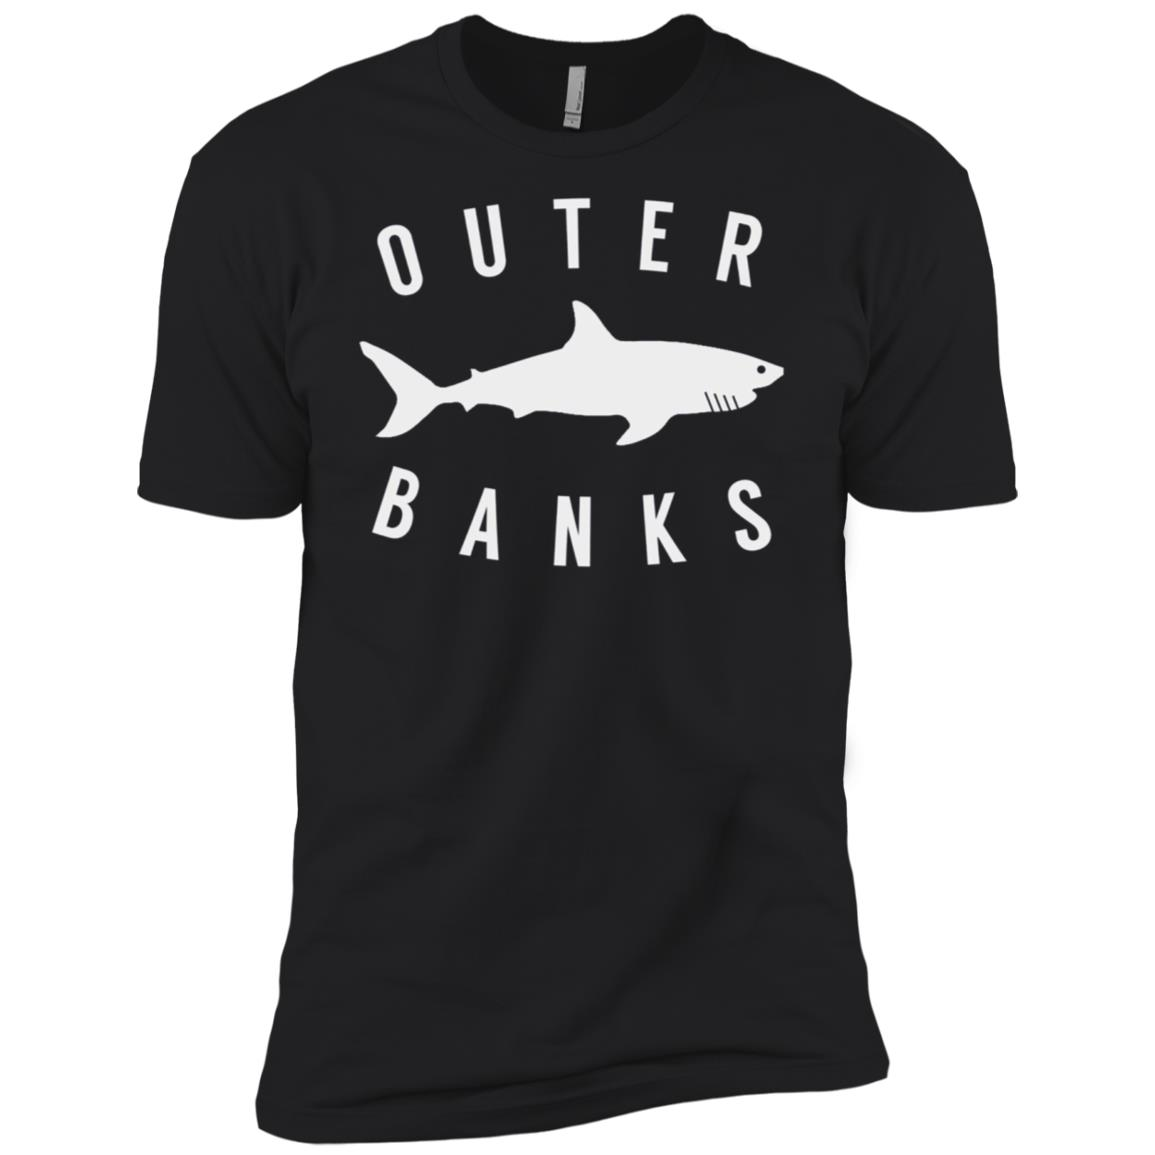 Outer Banks Nc Shark Obx North Carolina Vintage Tee Men Short Sleeve T-Shirt